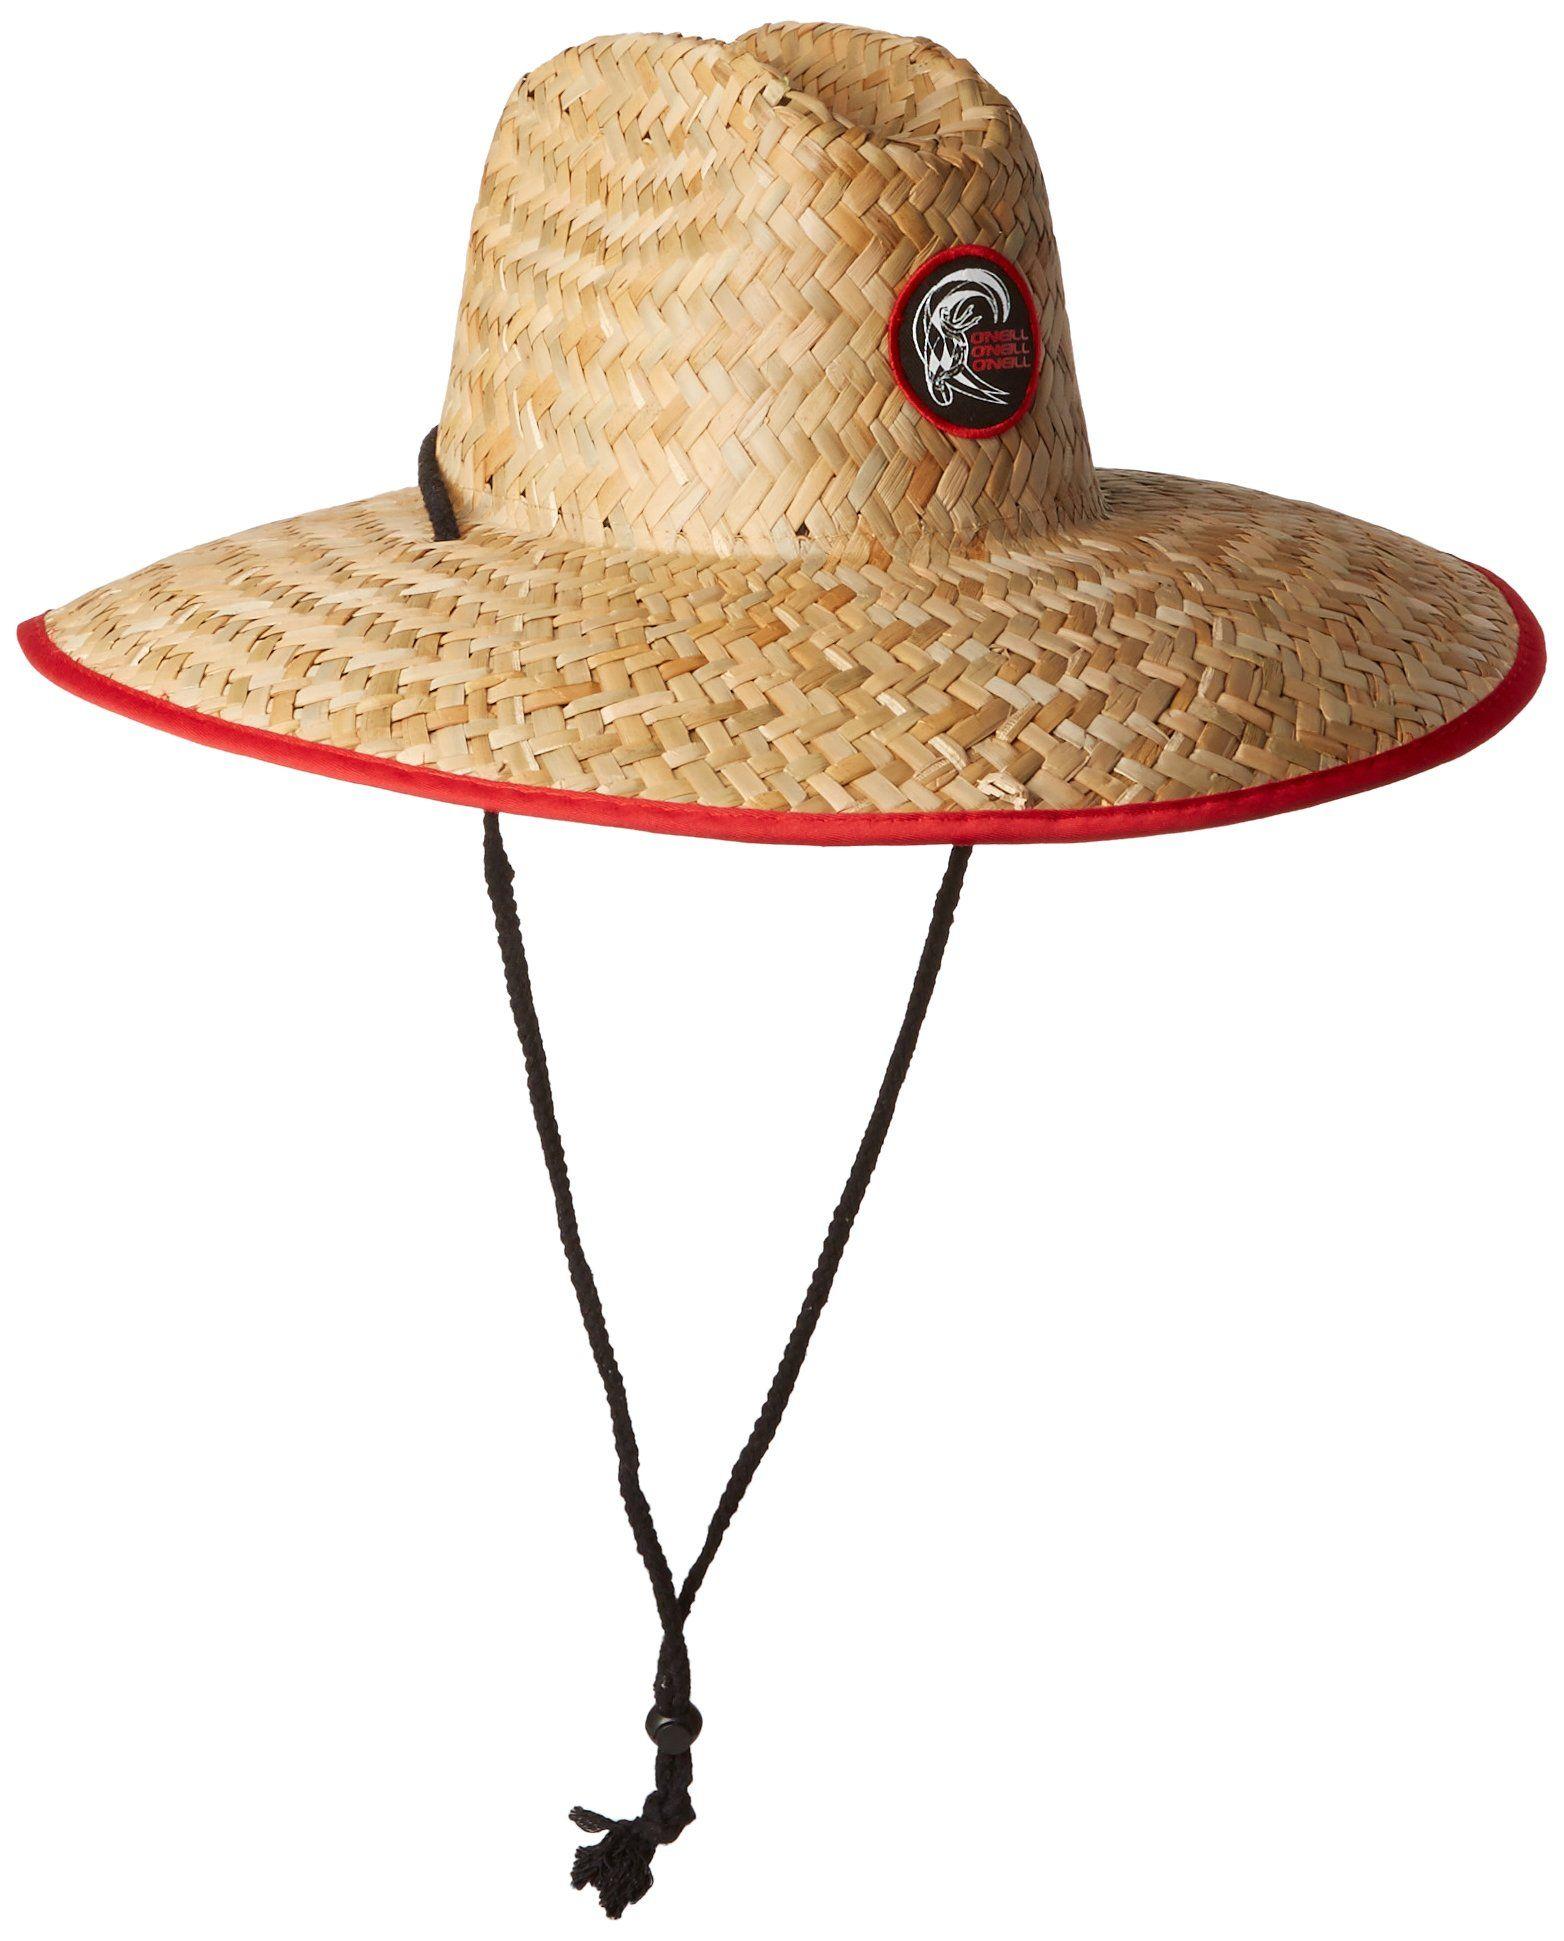 6570bbf216c577 Amazon.com: O'Neill Men's Sonoma Straw Lifeguard Hat, Red, One Size:  Clothing